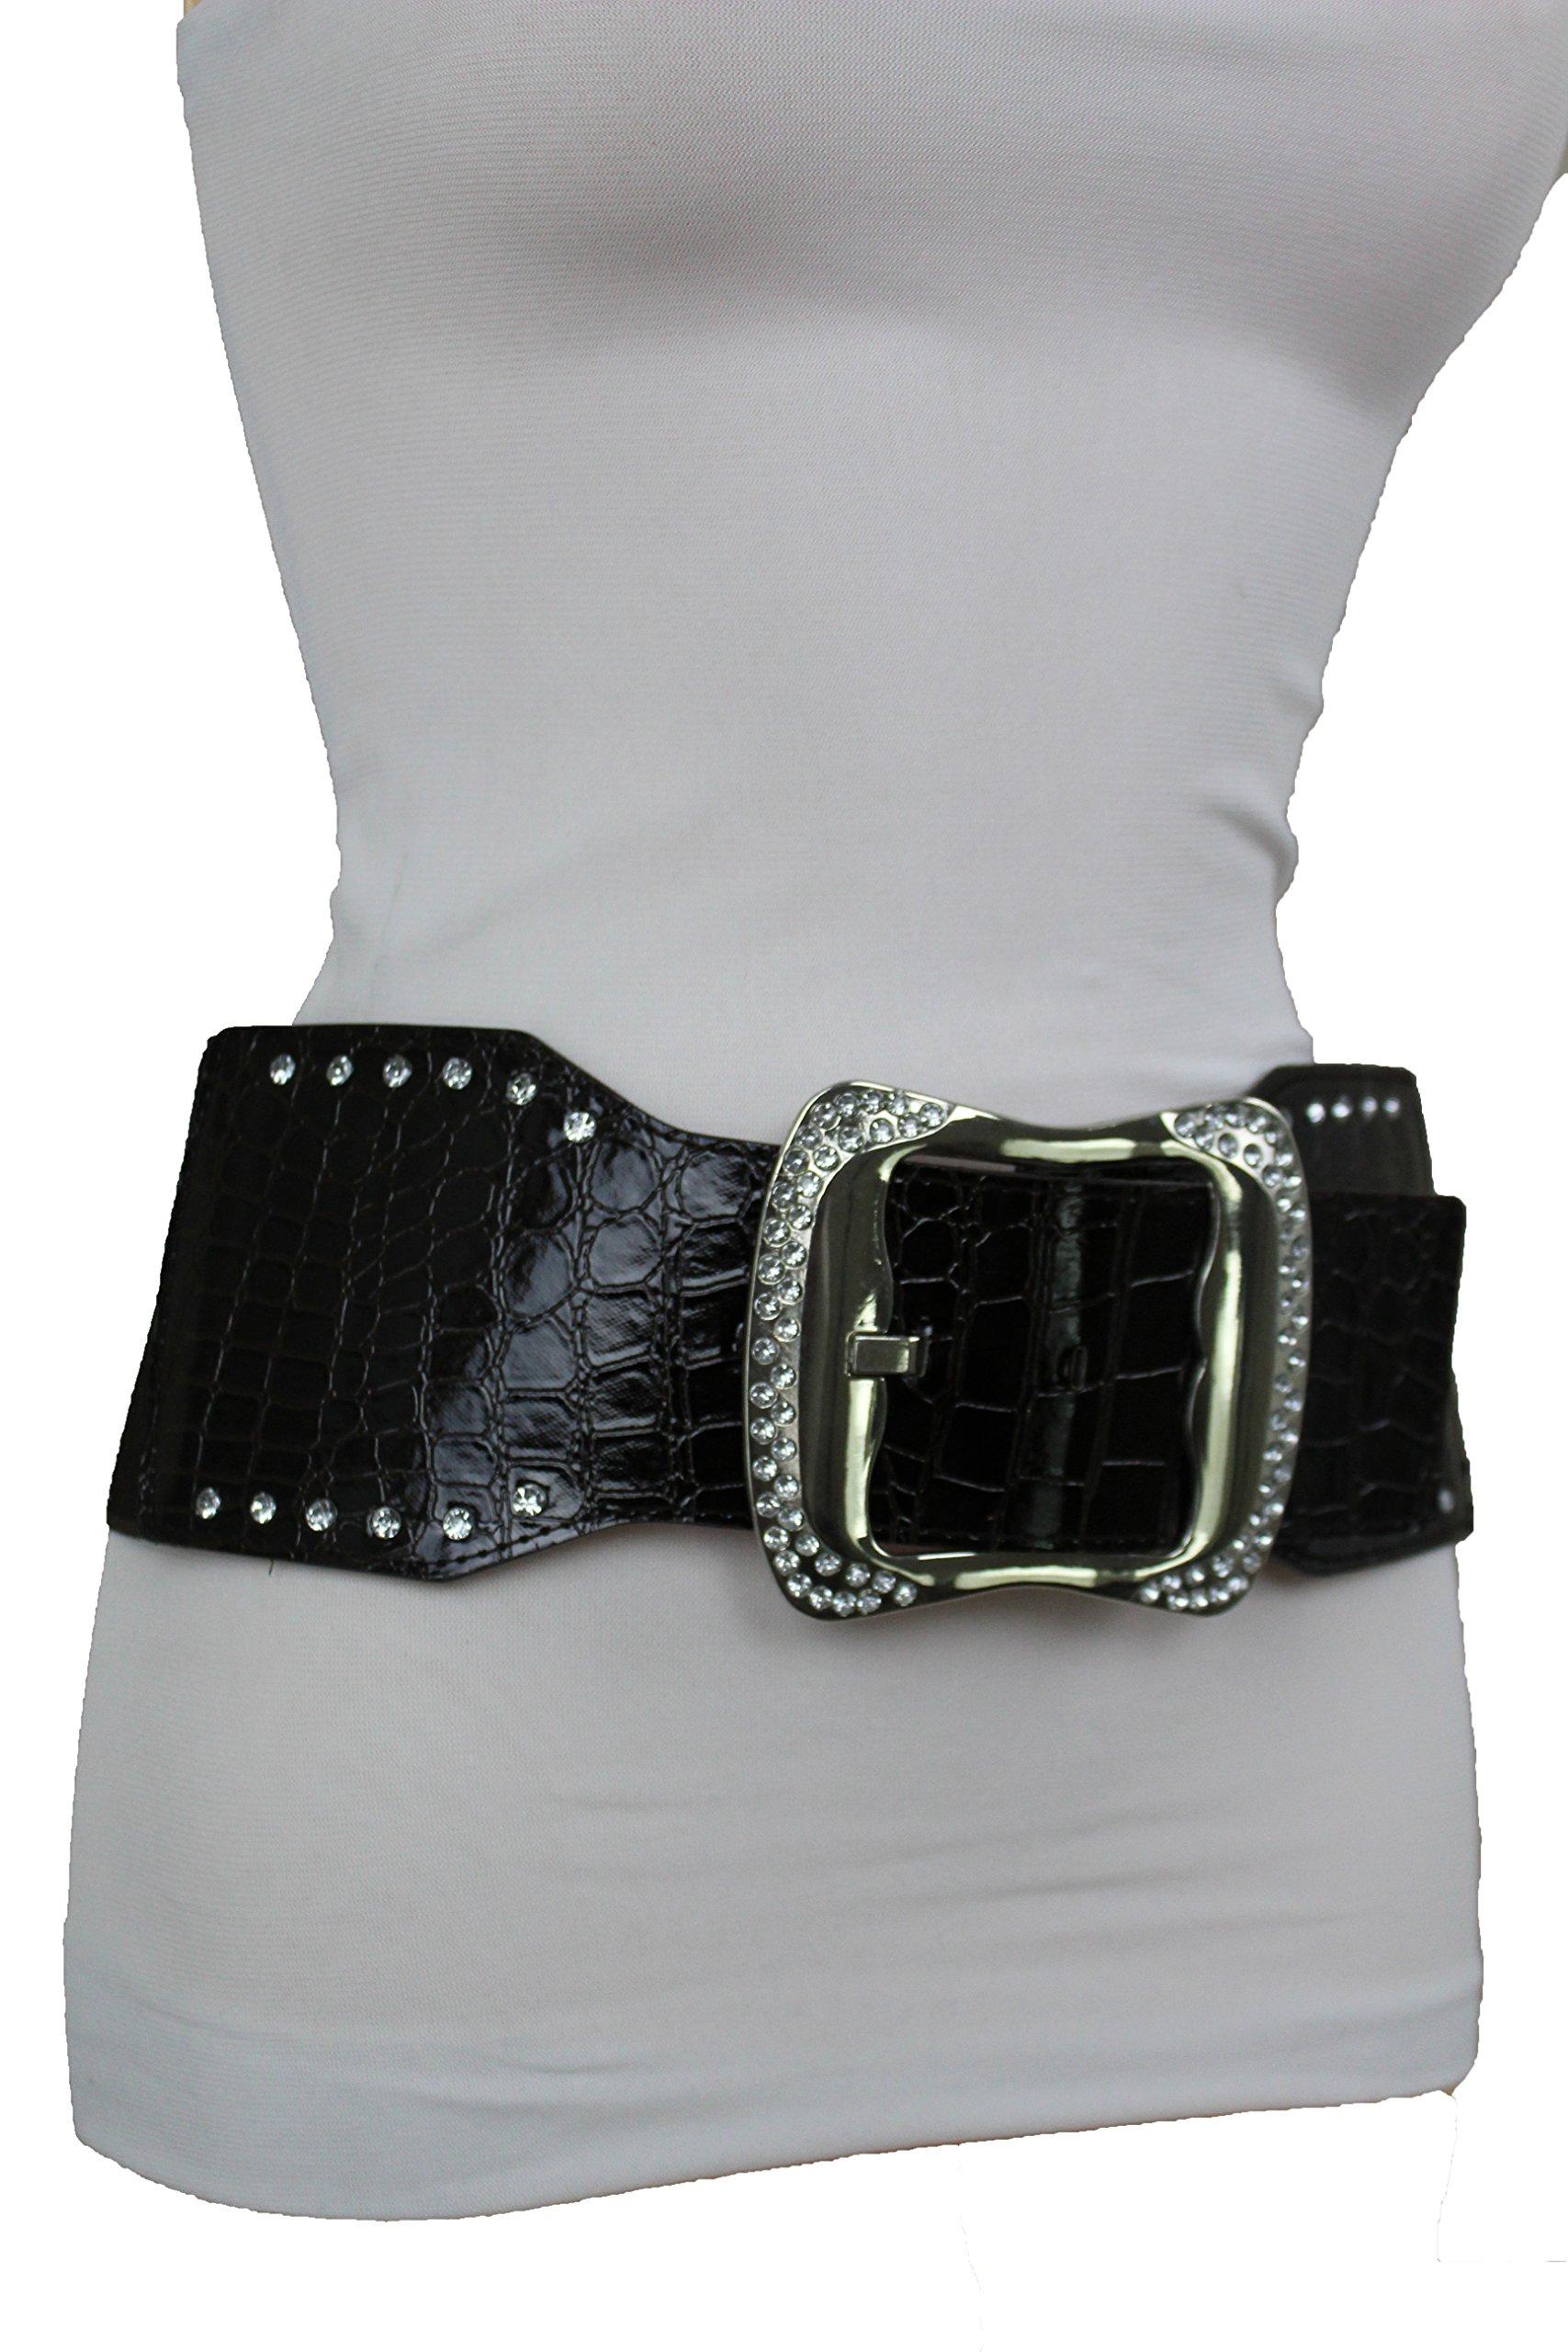 TFJ Women Fashion Wide Elastic Belt Hip Waist Silver Metal Bling Buckle Plus M L Black